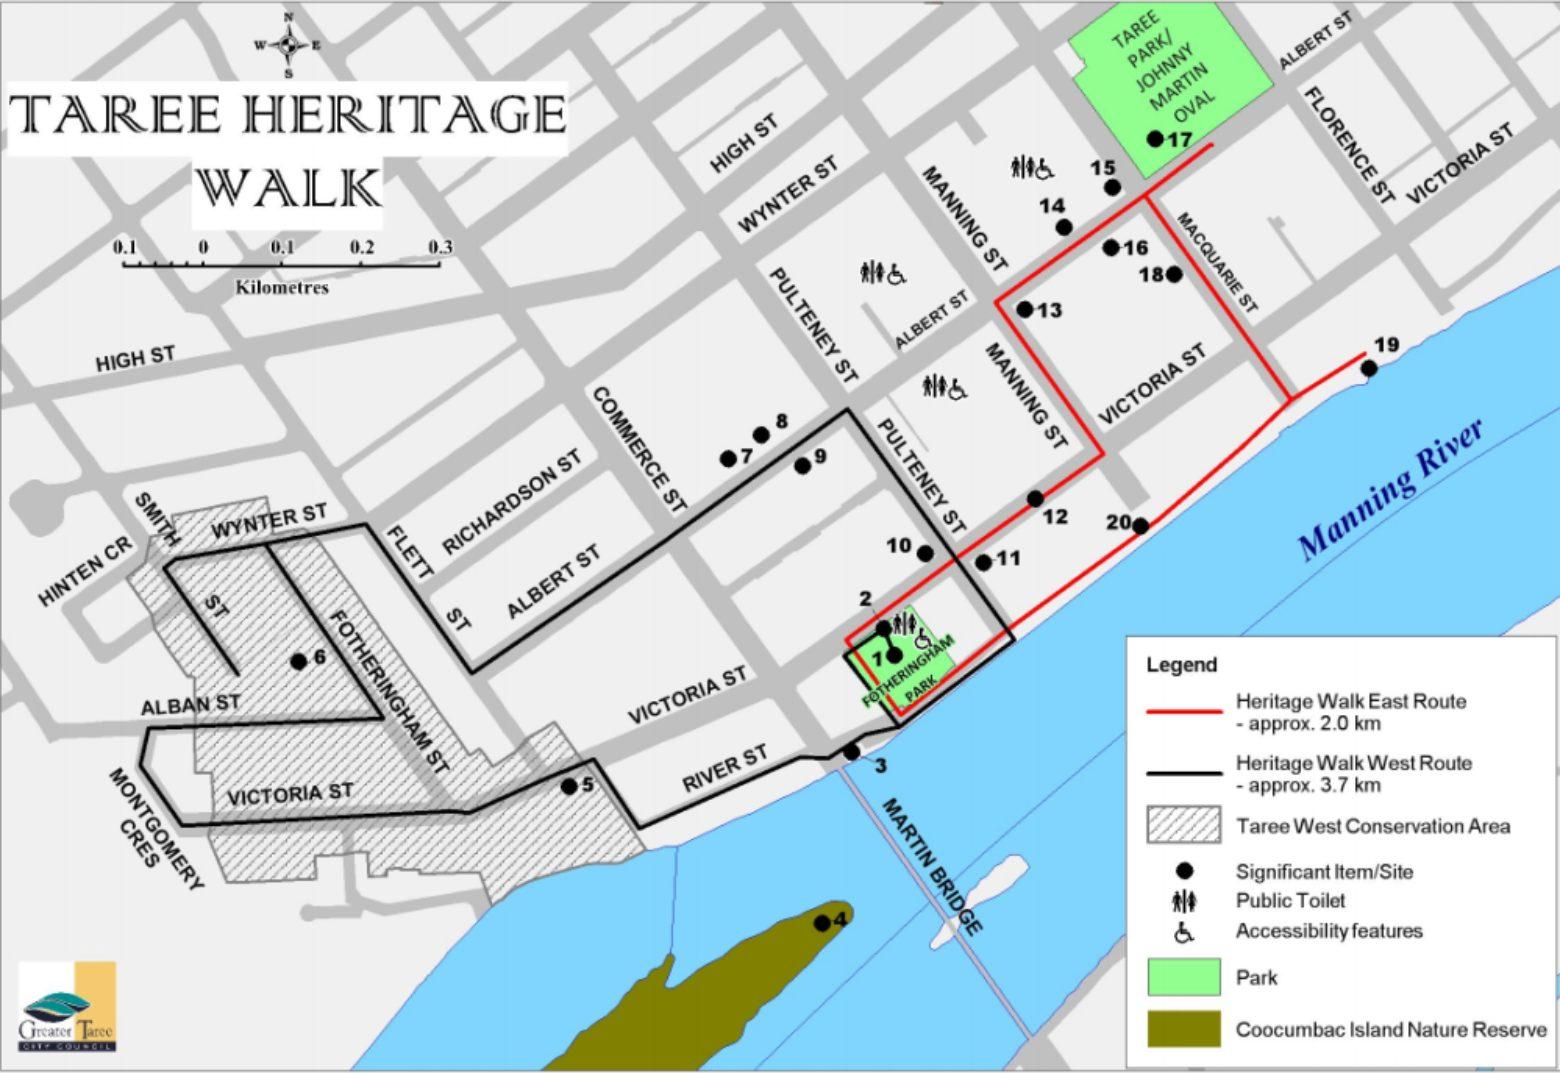 Taree Heritage Walk reference map